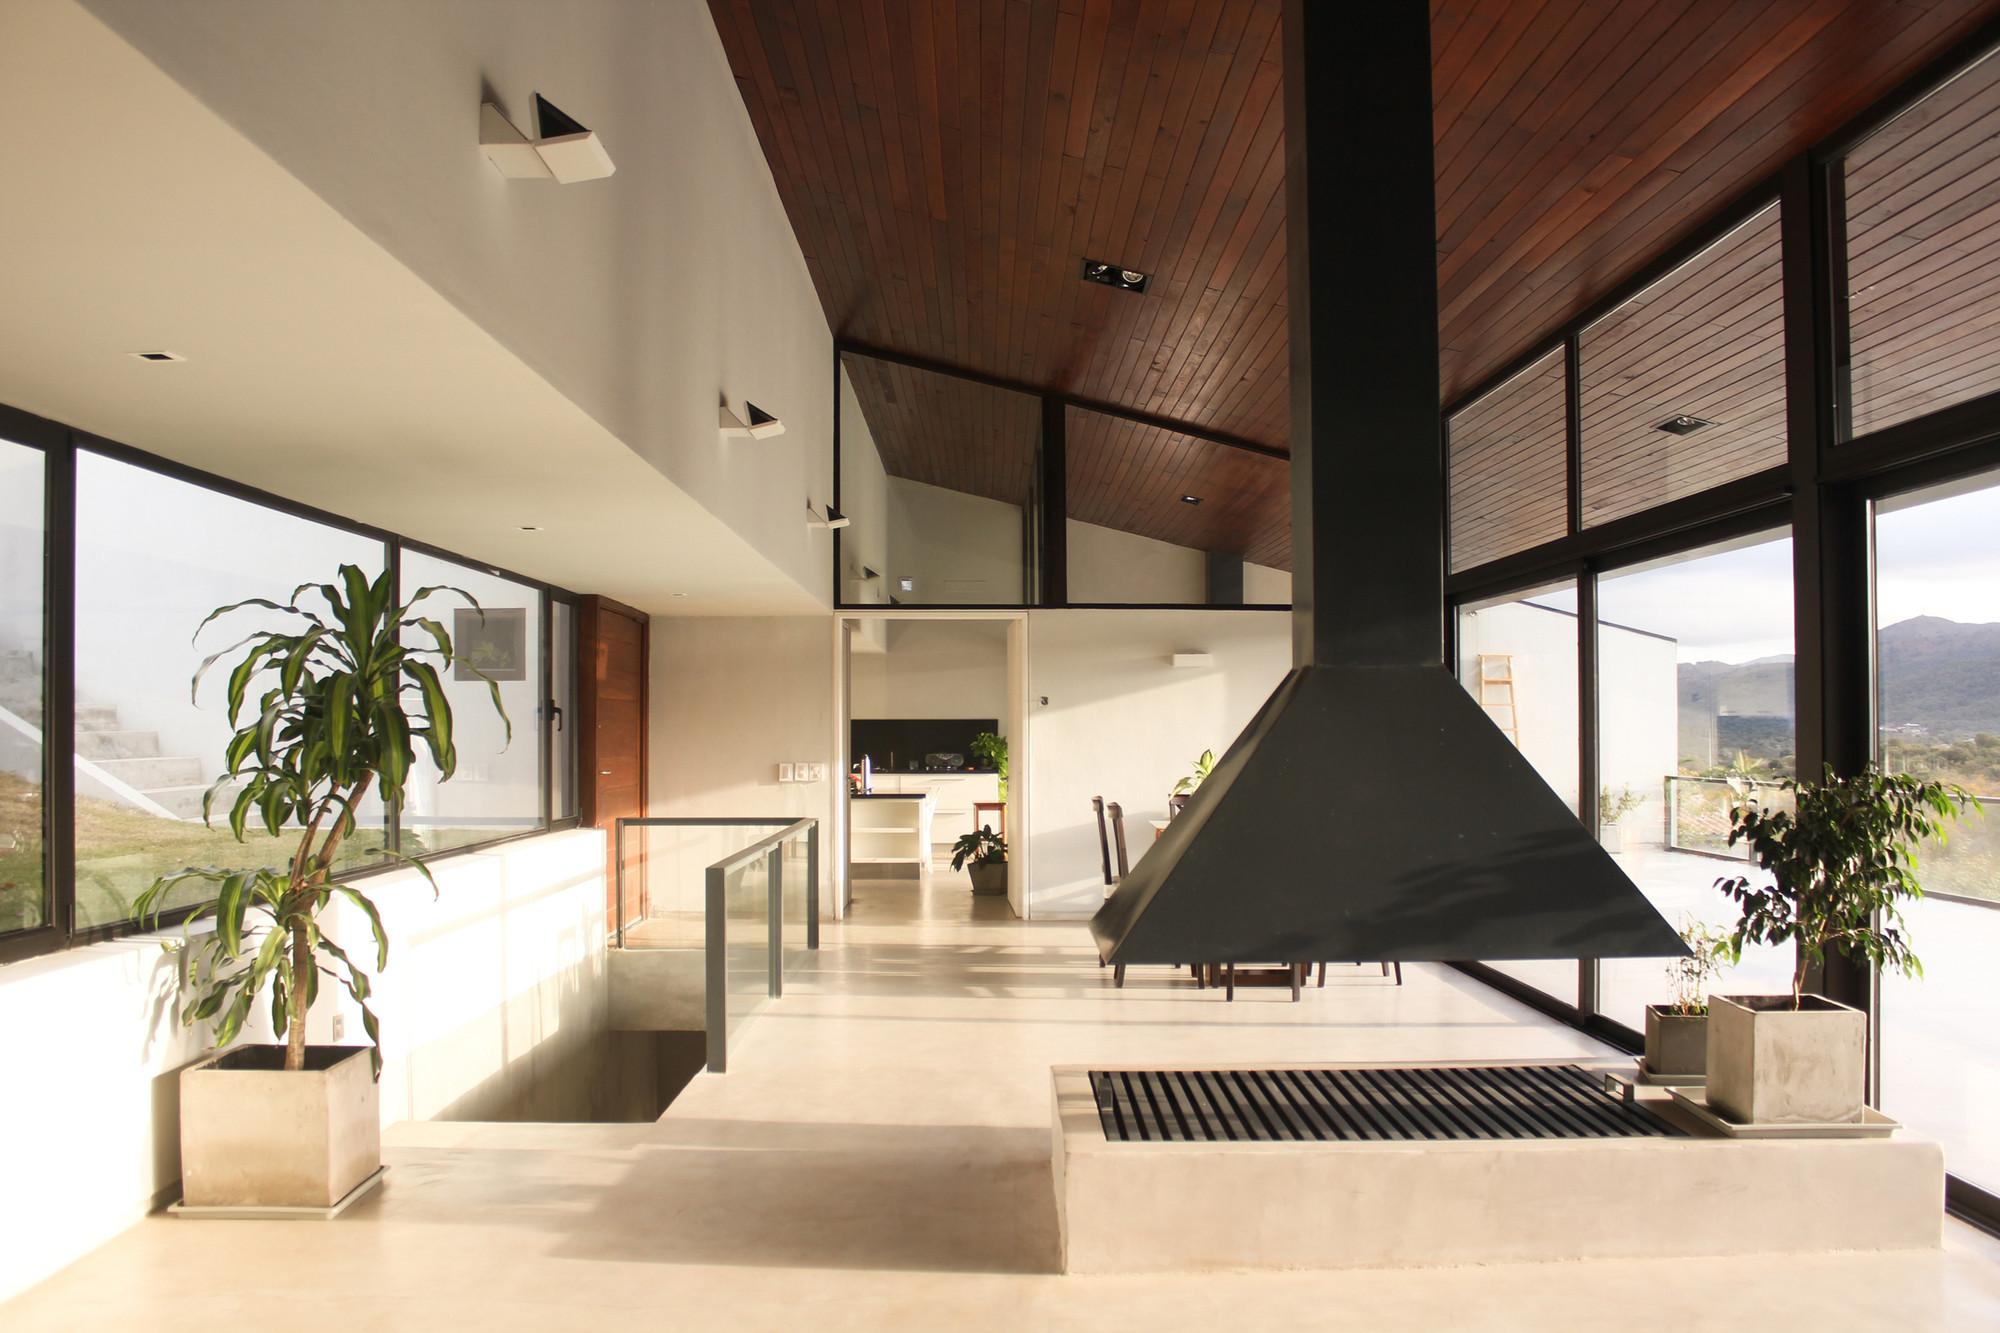 Casa FD / alarciaferrer arquitectos, © Florencia Ferrer Deheza